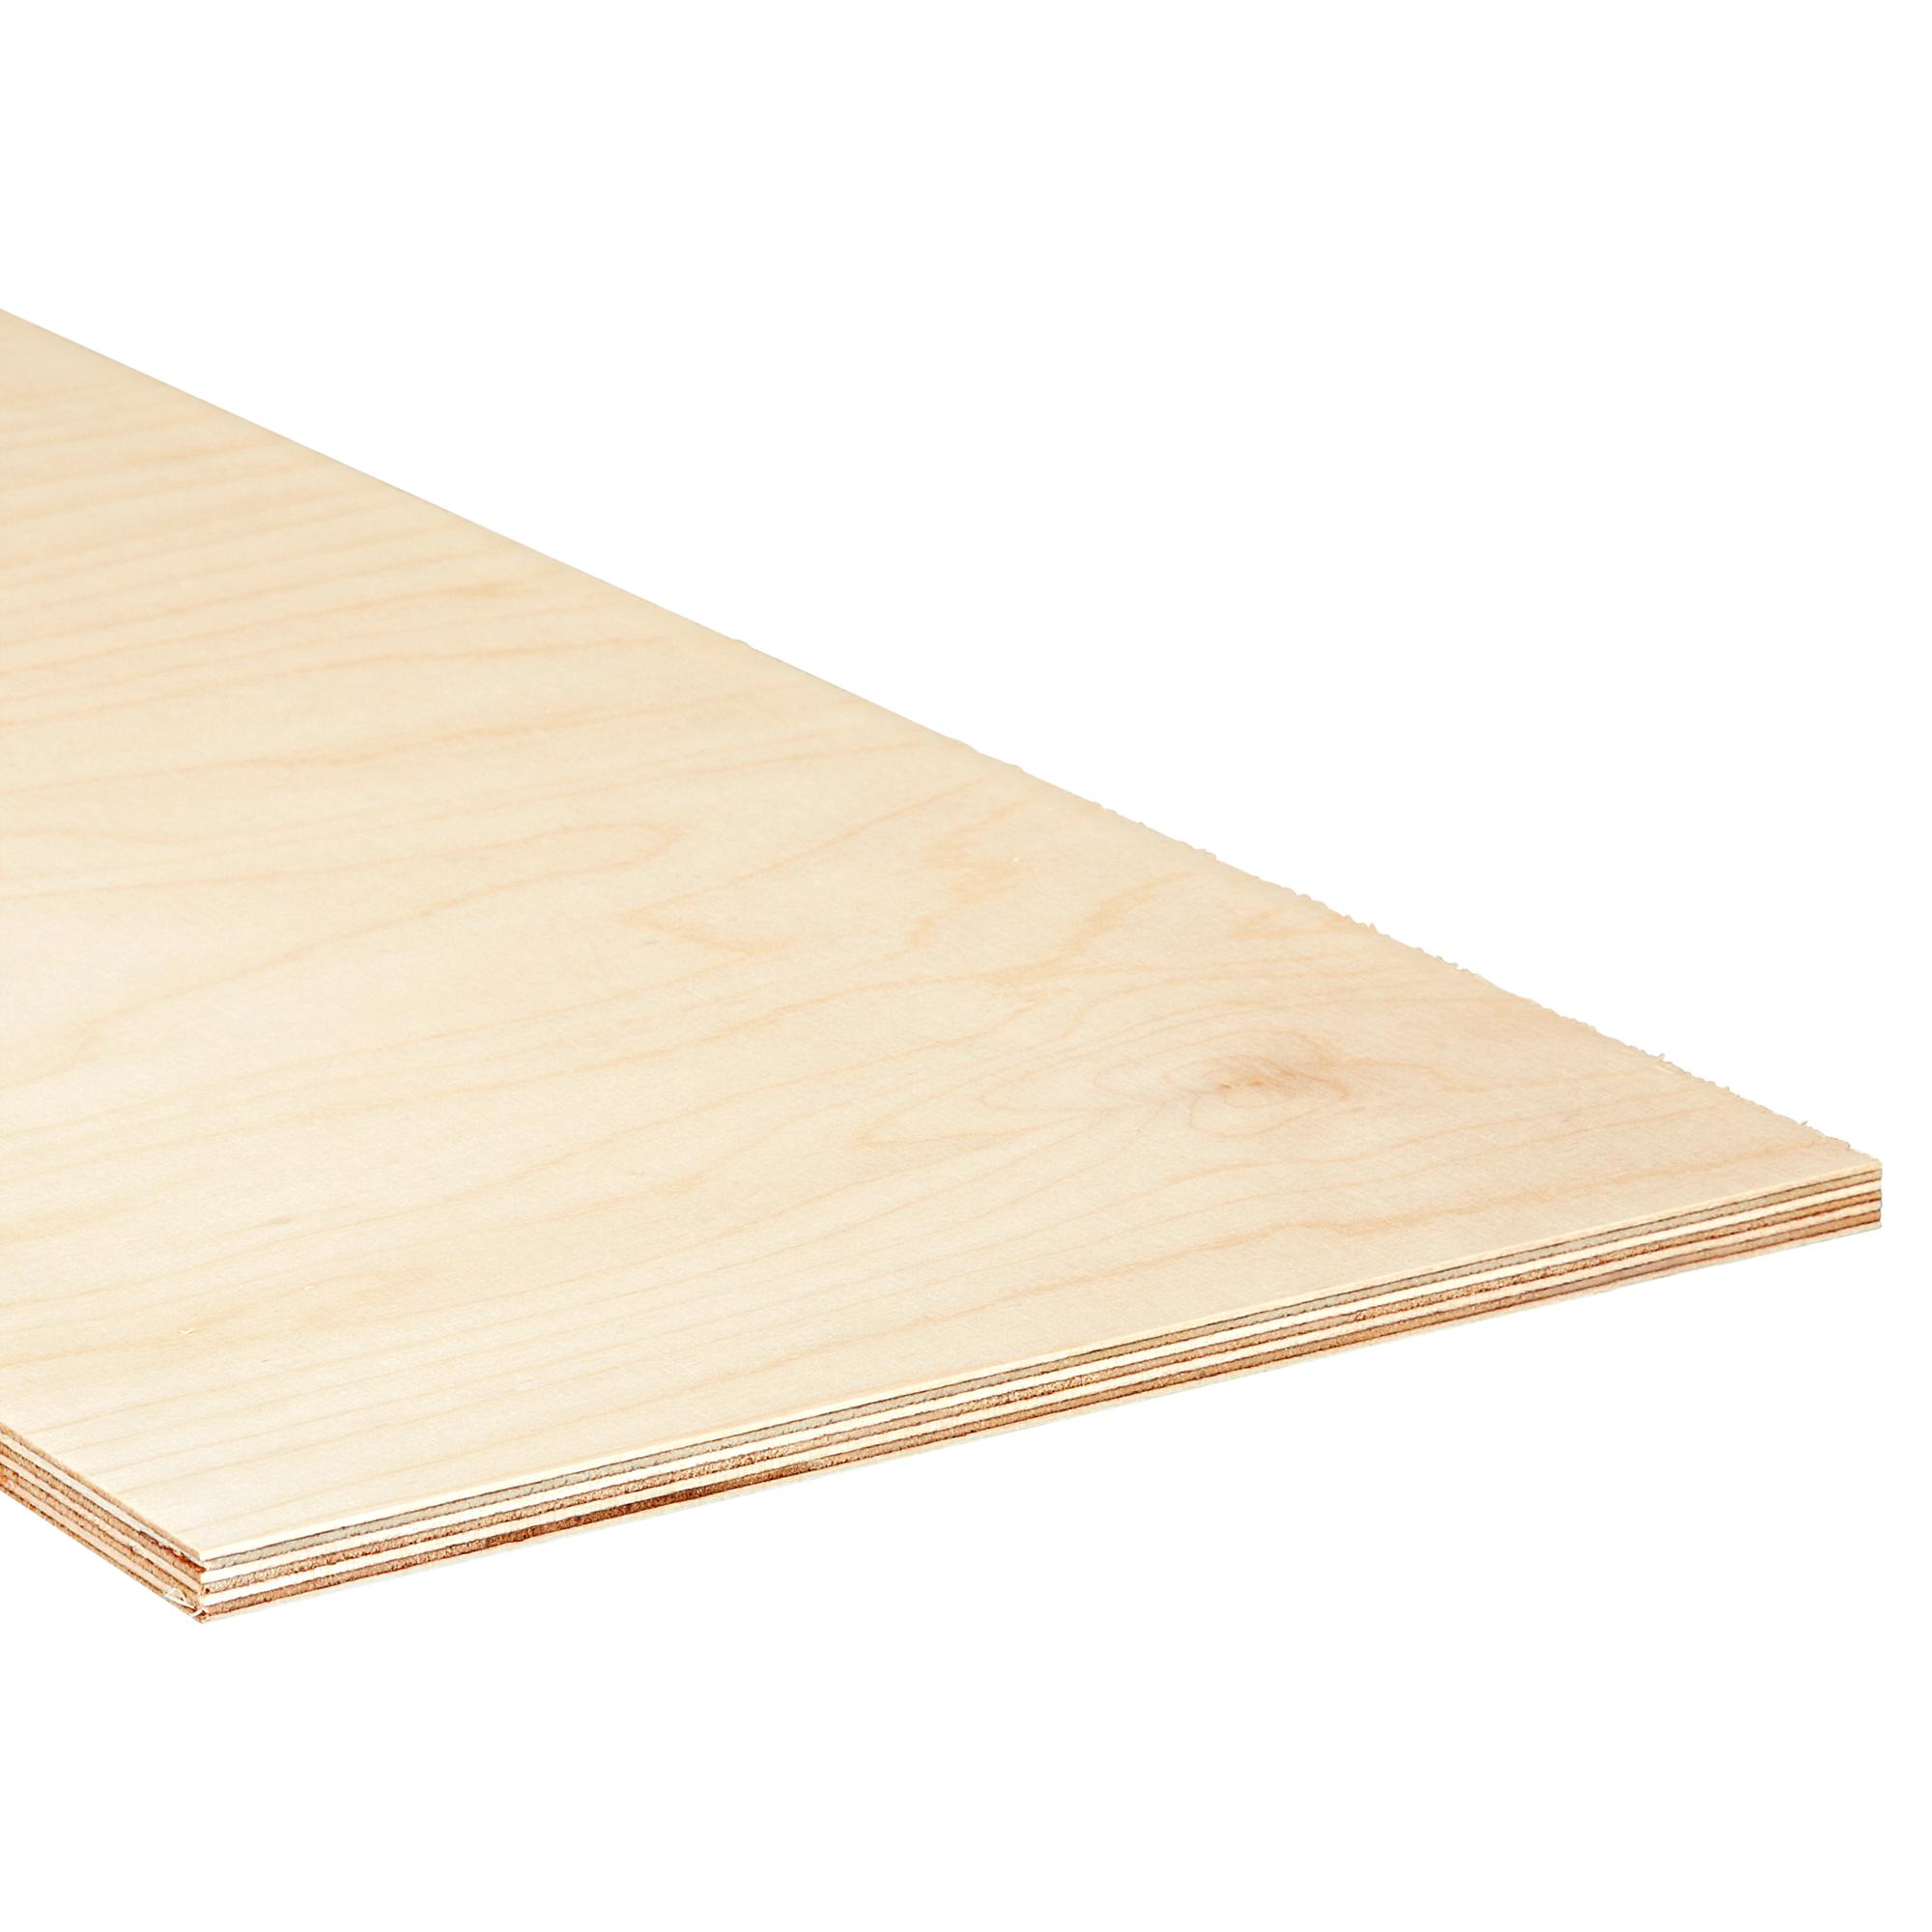 GP 8,92 /€ pro m/² 76 x 50cm PiHaMi/® 3 mm Birke Sperrholzplatte Qualit/ät B//BB